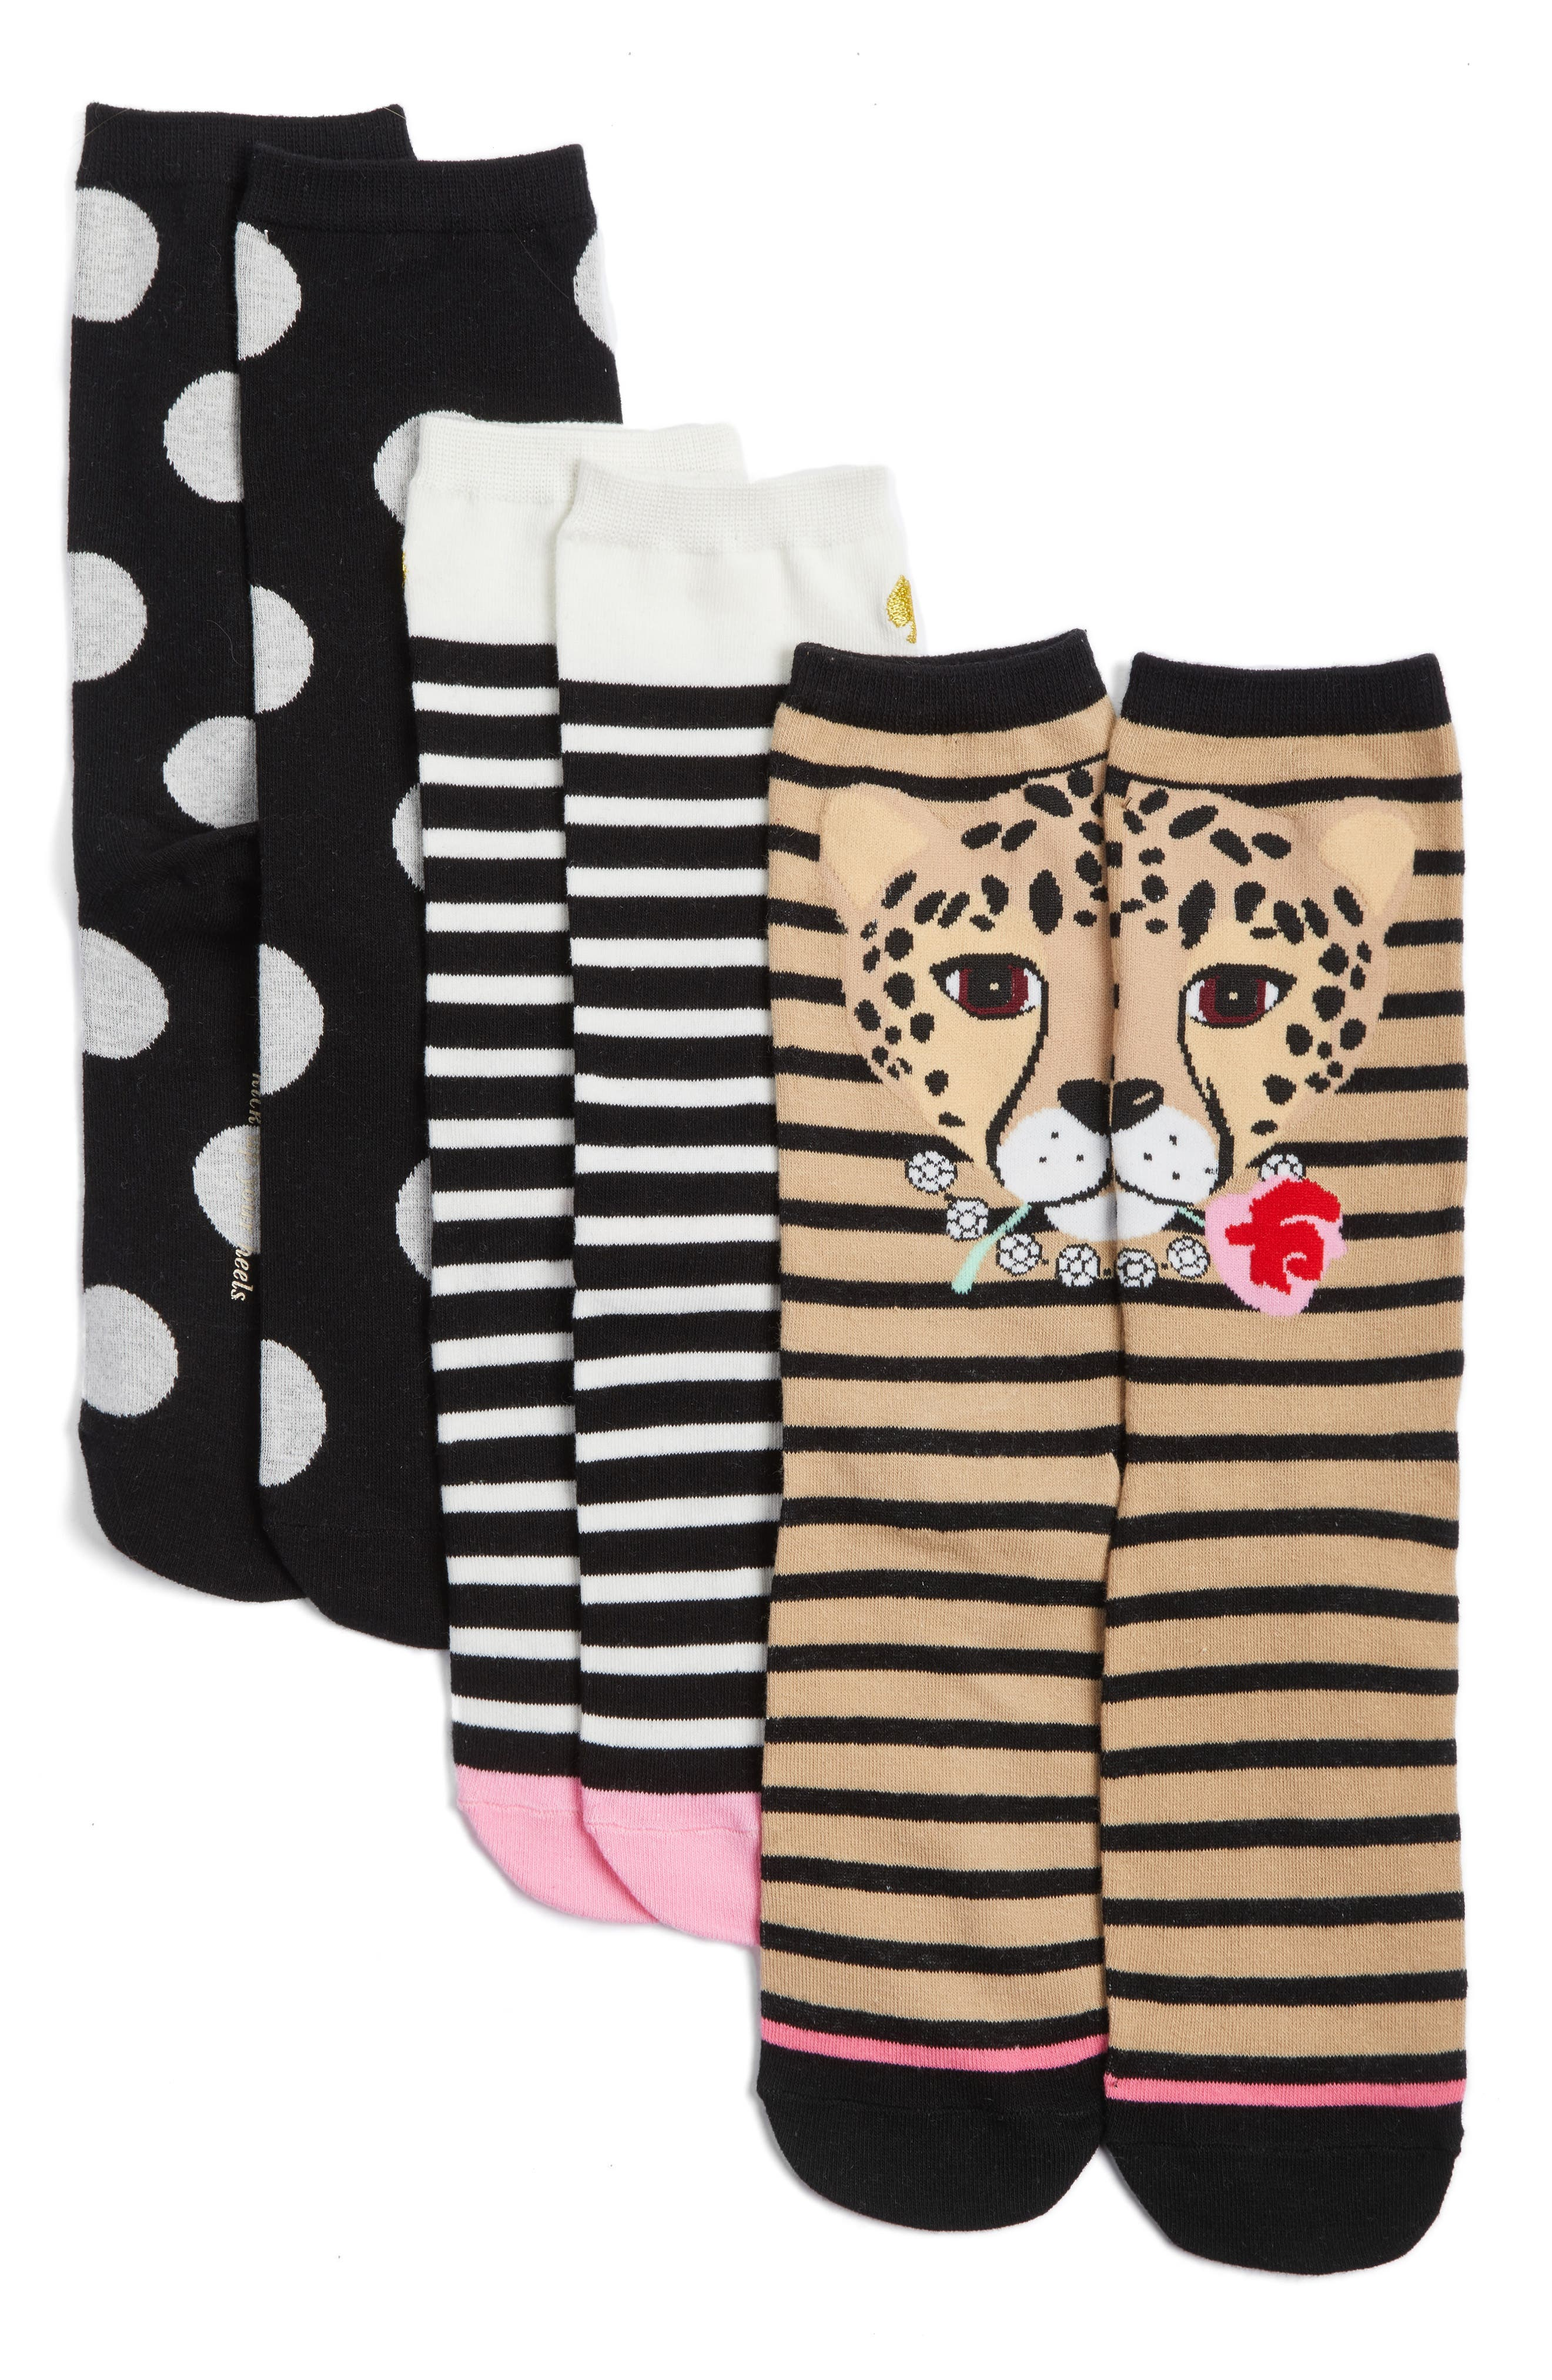 3-pack cheetah trouser socks,                             Main thumbnail 1, color,                             250